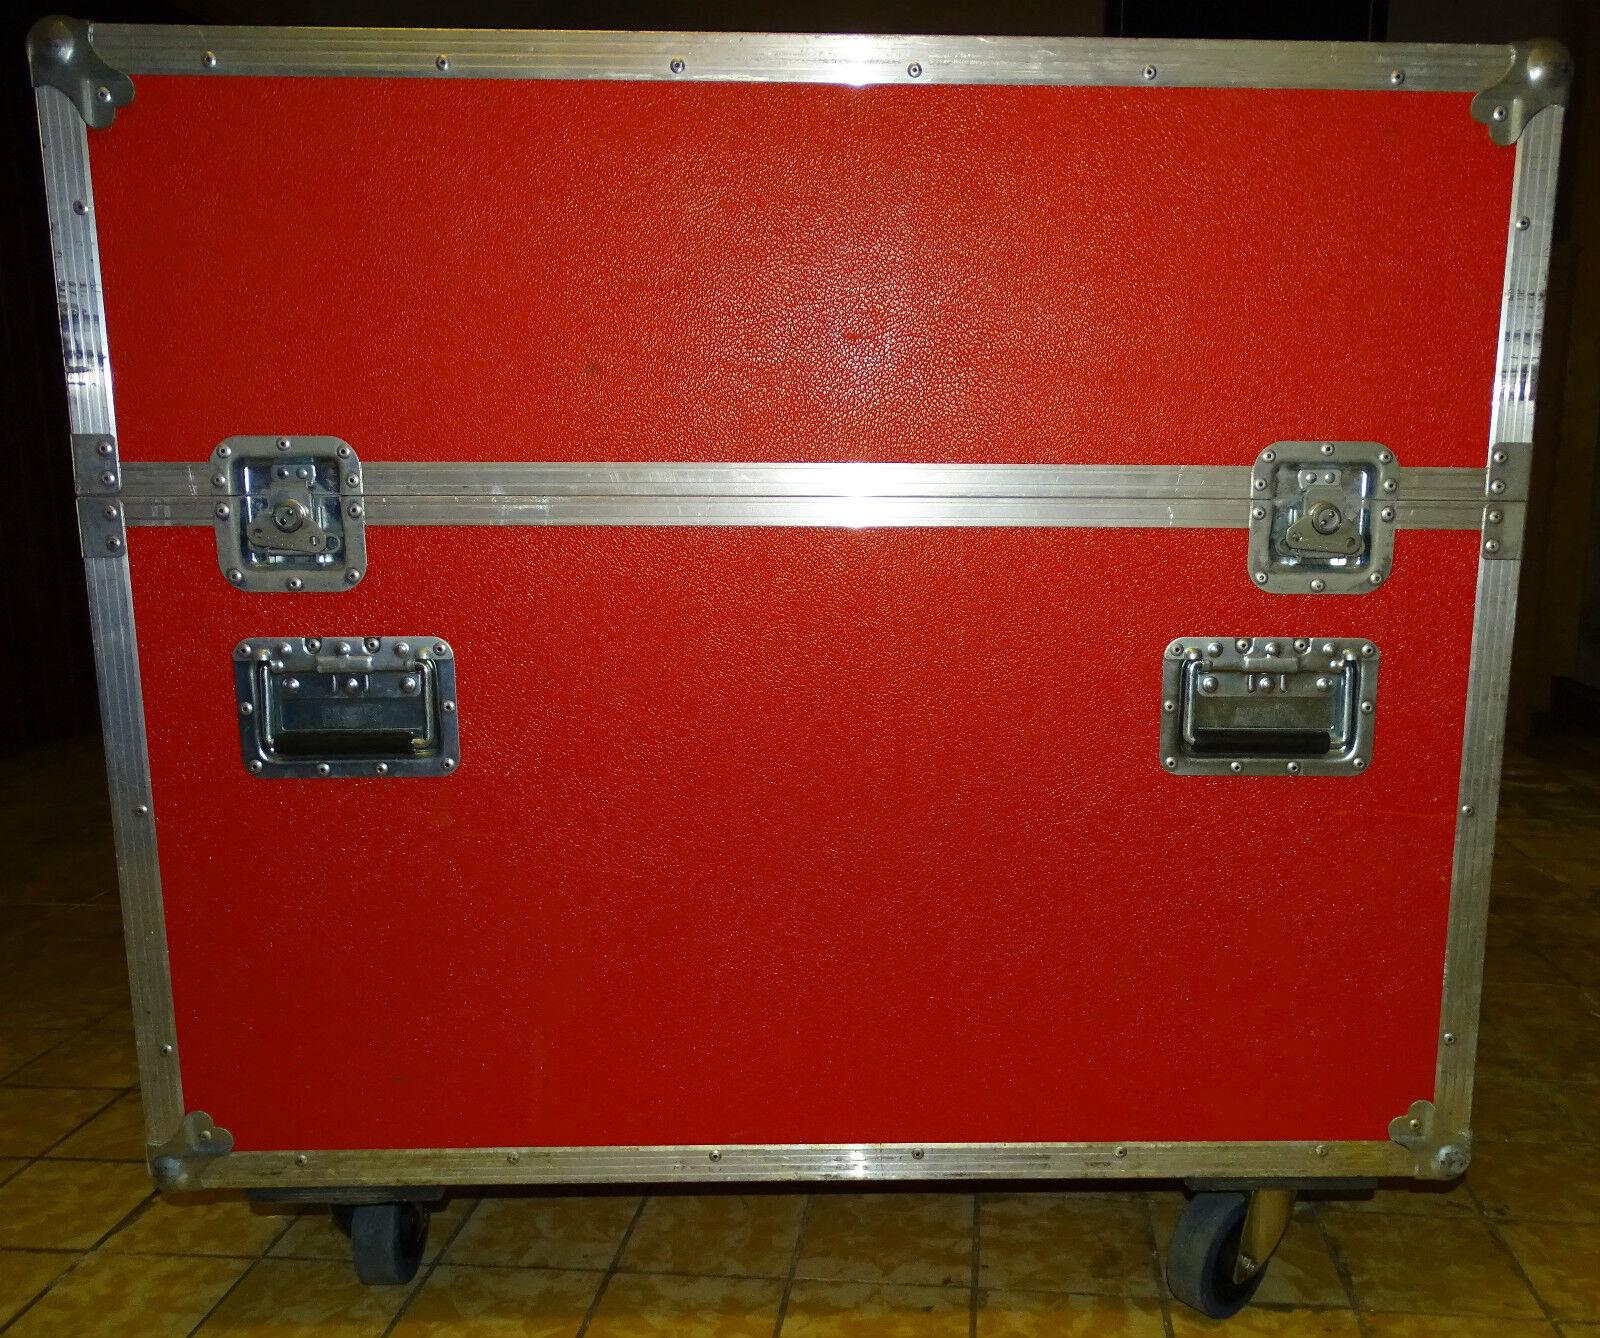 Transportcase für TFT, Flatscreen, Monitor, TV, Flachbildfernseher, Flightcase